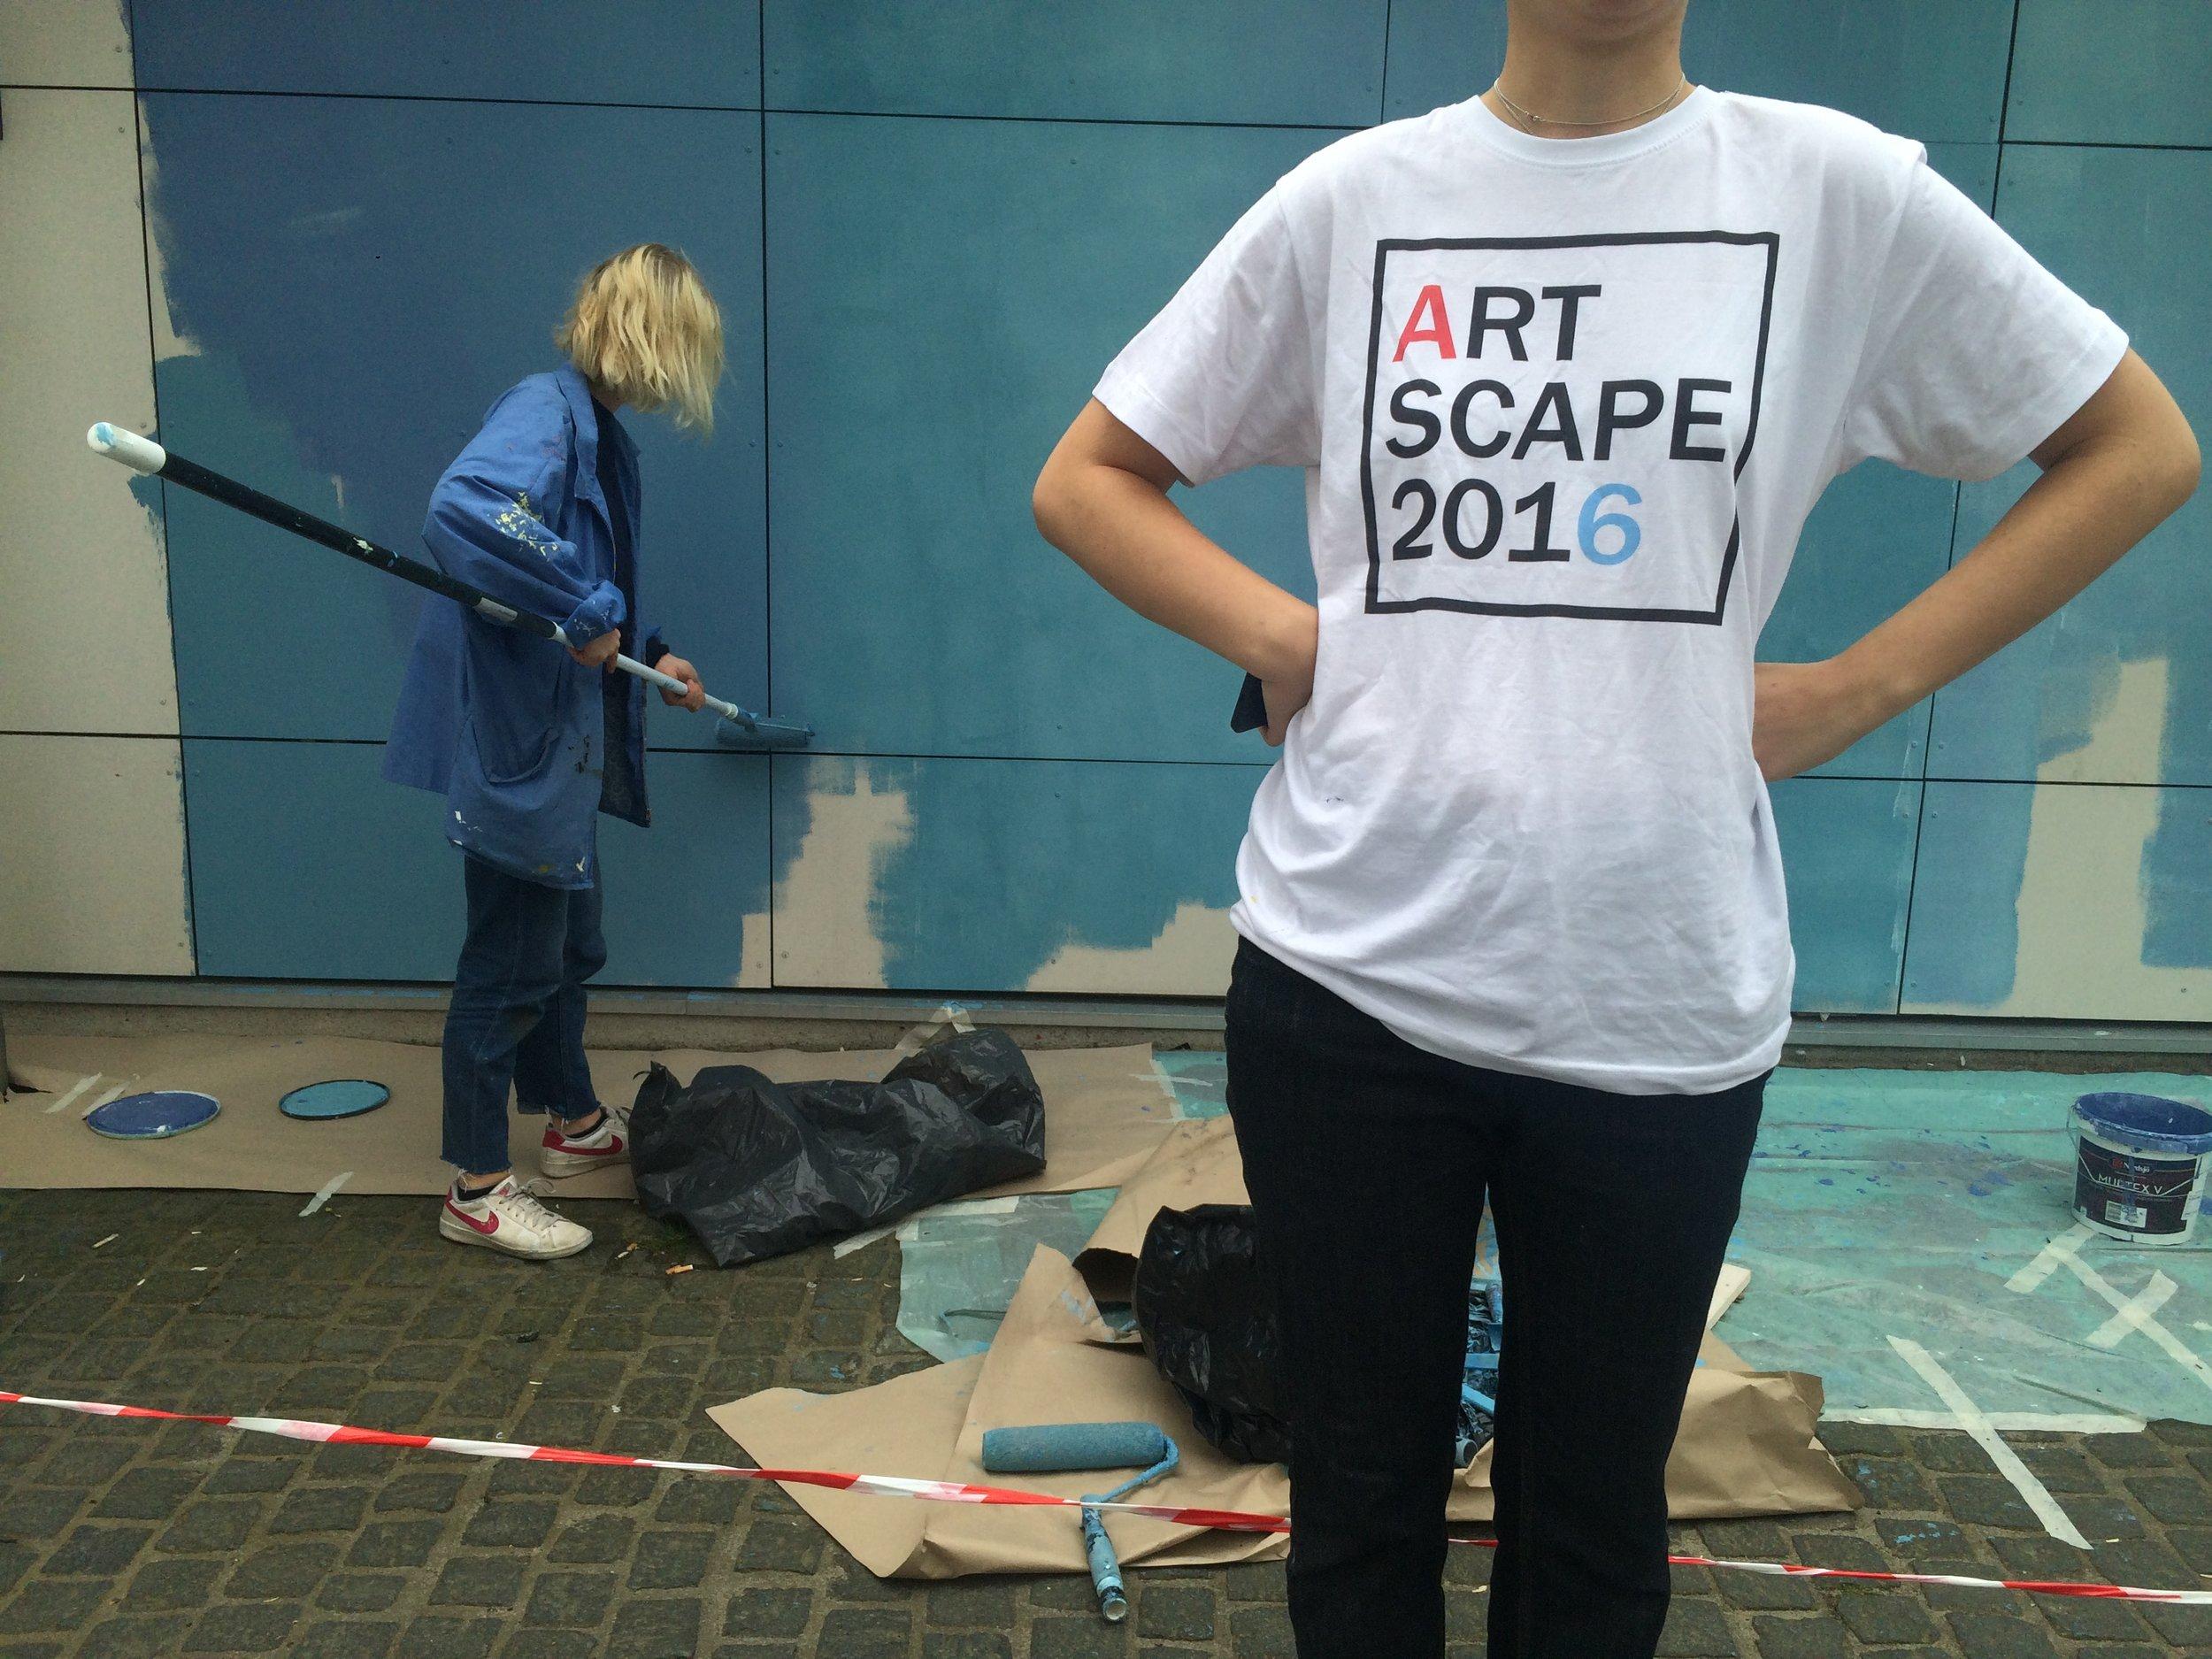 WORKSHOP-RYMDTORGET_Artscape_2016-08-06_MajliAfEkenstam_3264x2448_38.JPG